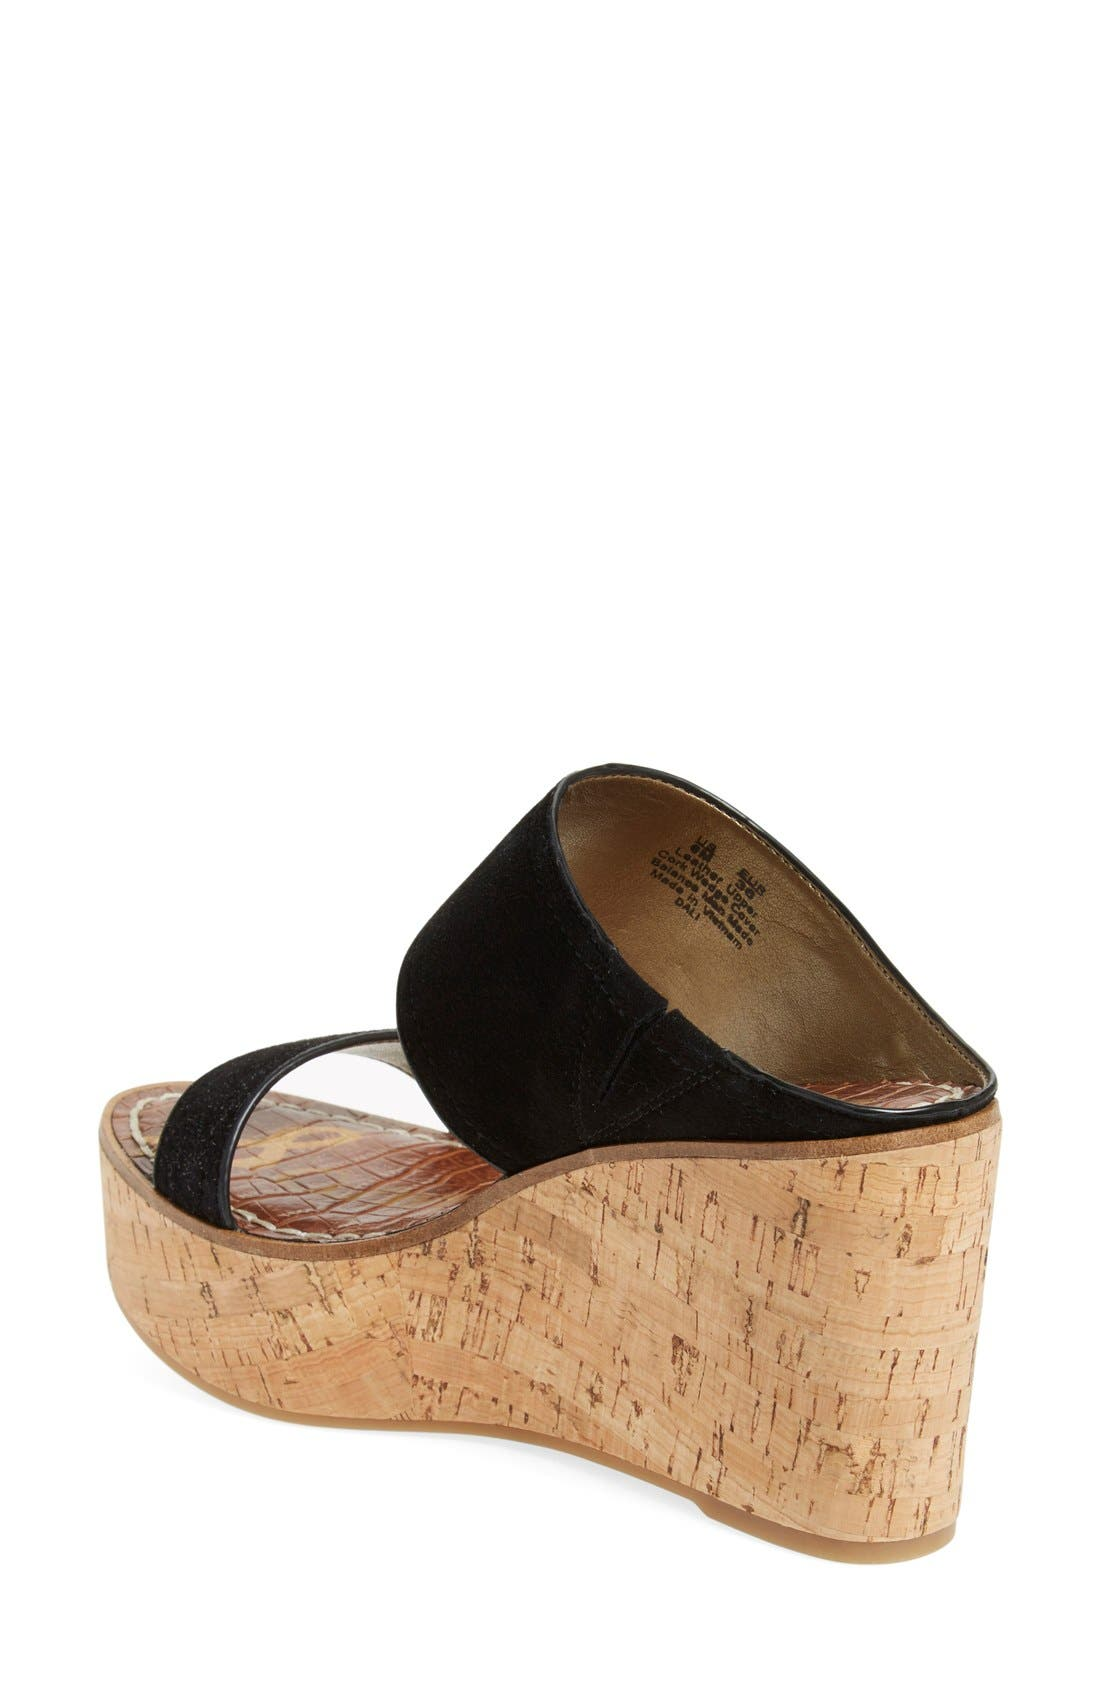 'Dali' Wedge Sandal,                             Alternate thumbnail 2, color,                             Black Suede